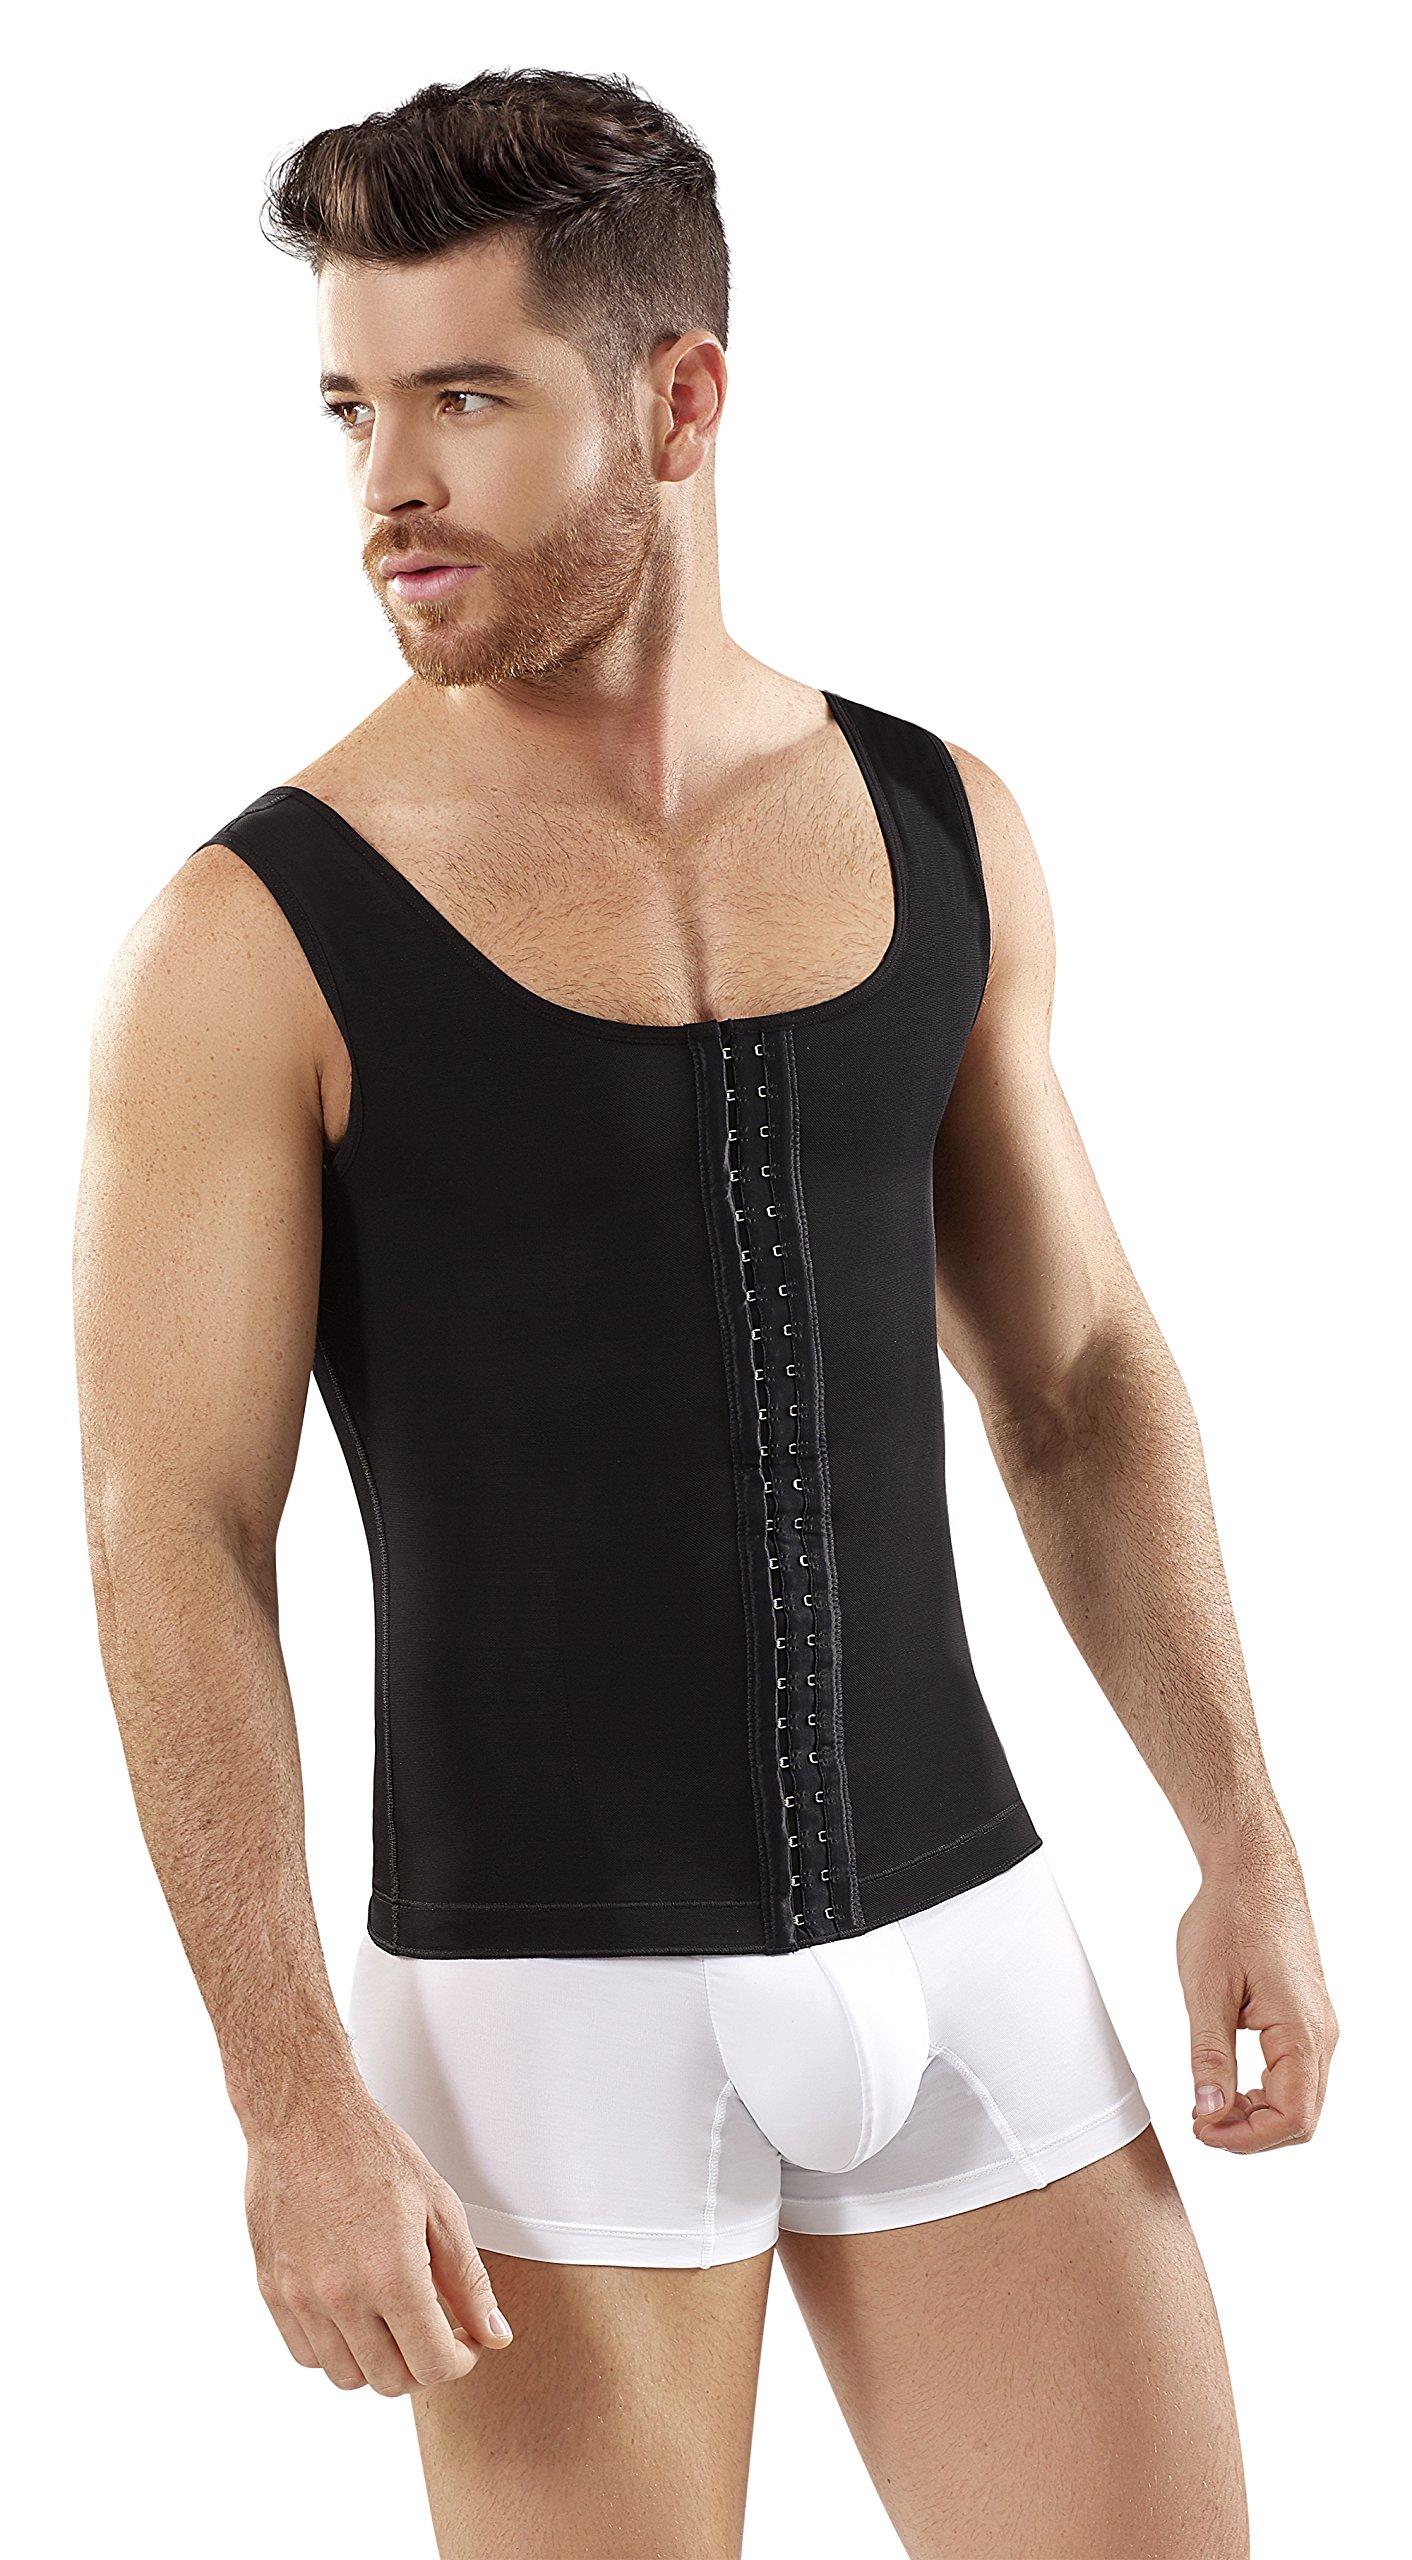 Fajas Colombianas Para Hombres Mens Girdle High Compression Garmen Shapewear Bodysuit Faja Body Shaper for Men SCH0062 (Black, XXX-Large)